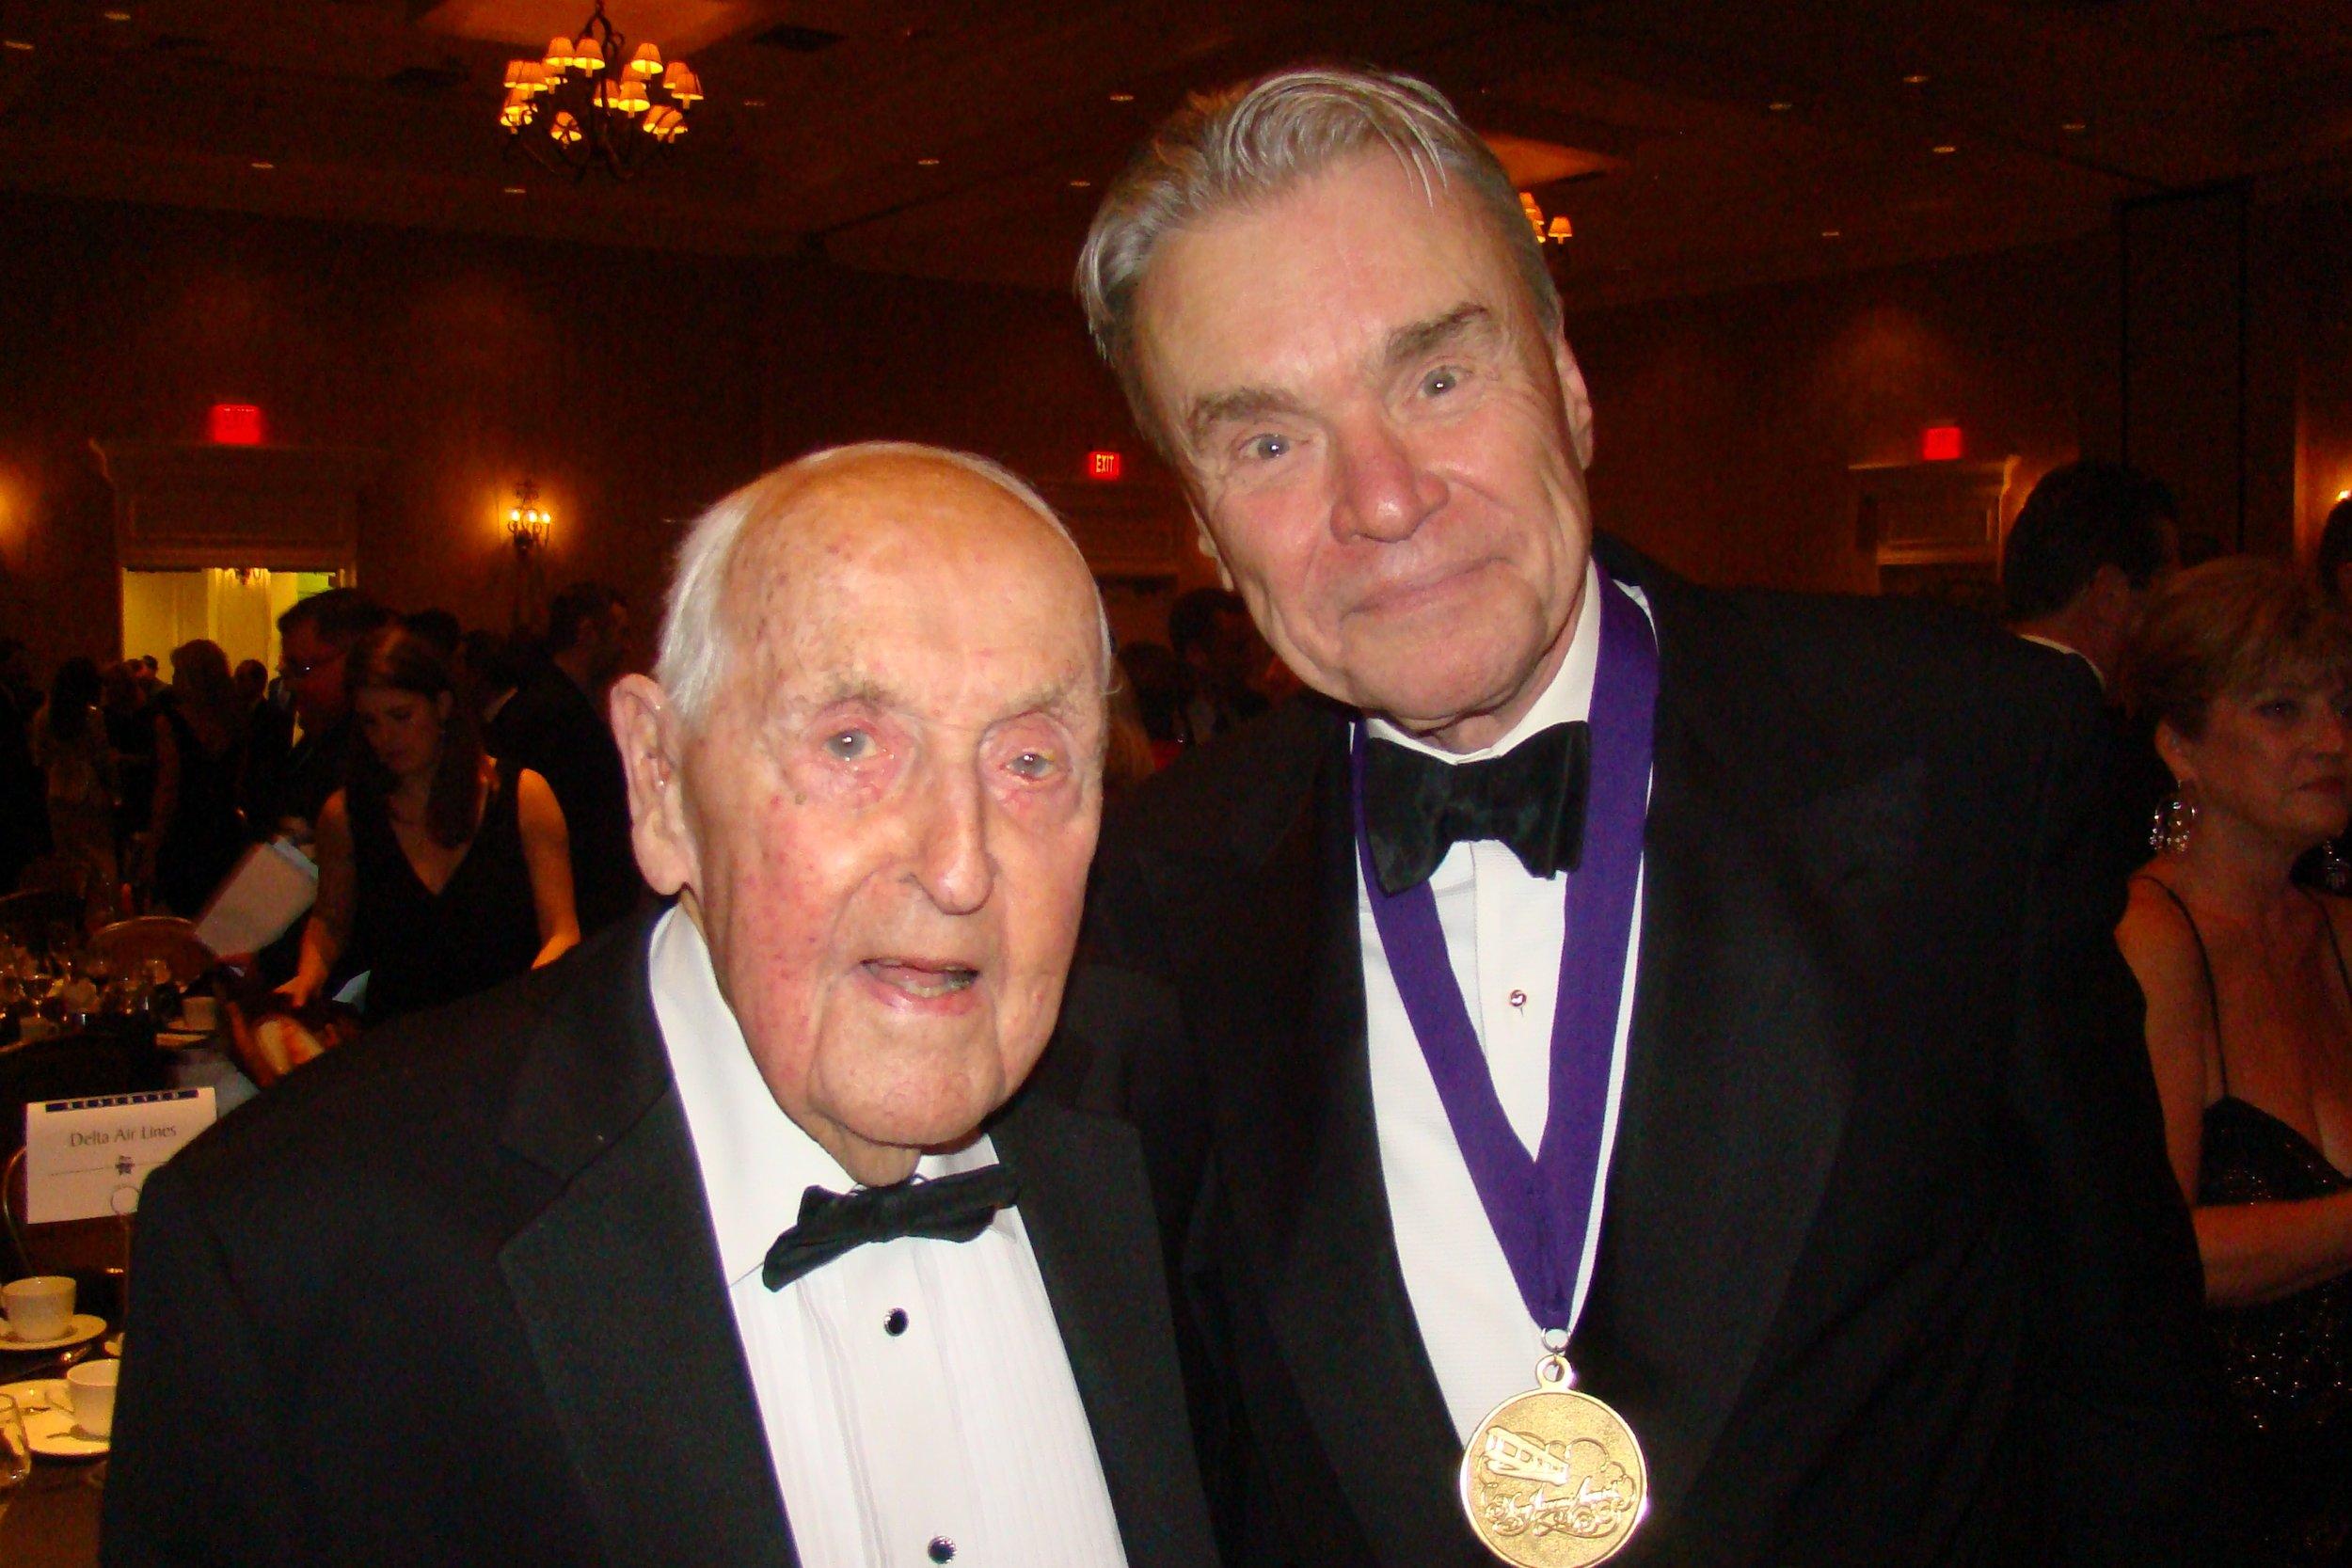 Sir Lenox Hewitt & Gordon Bethune - 1, 15 Nov '13 - Copy (2).JPG